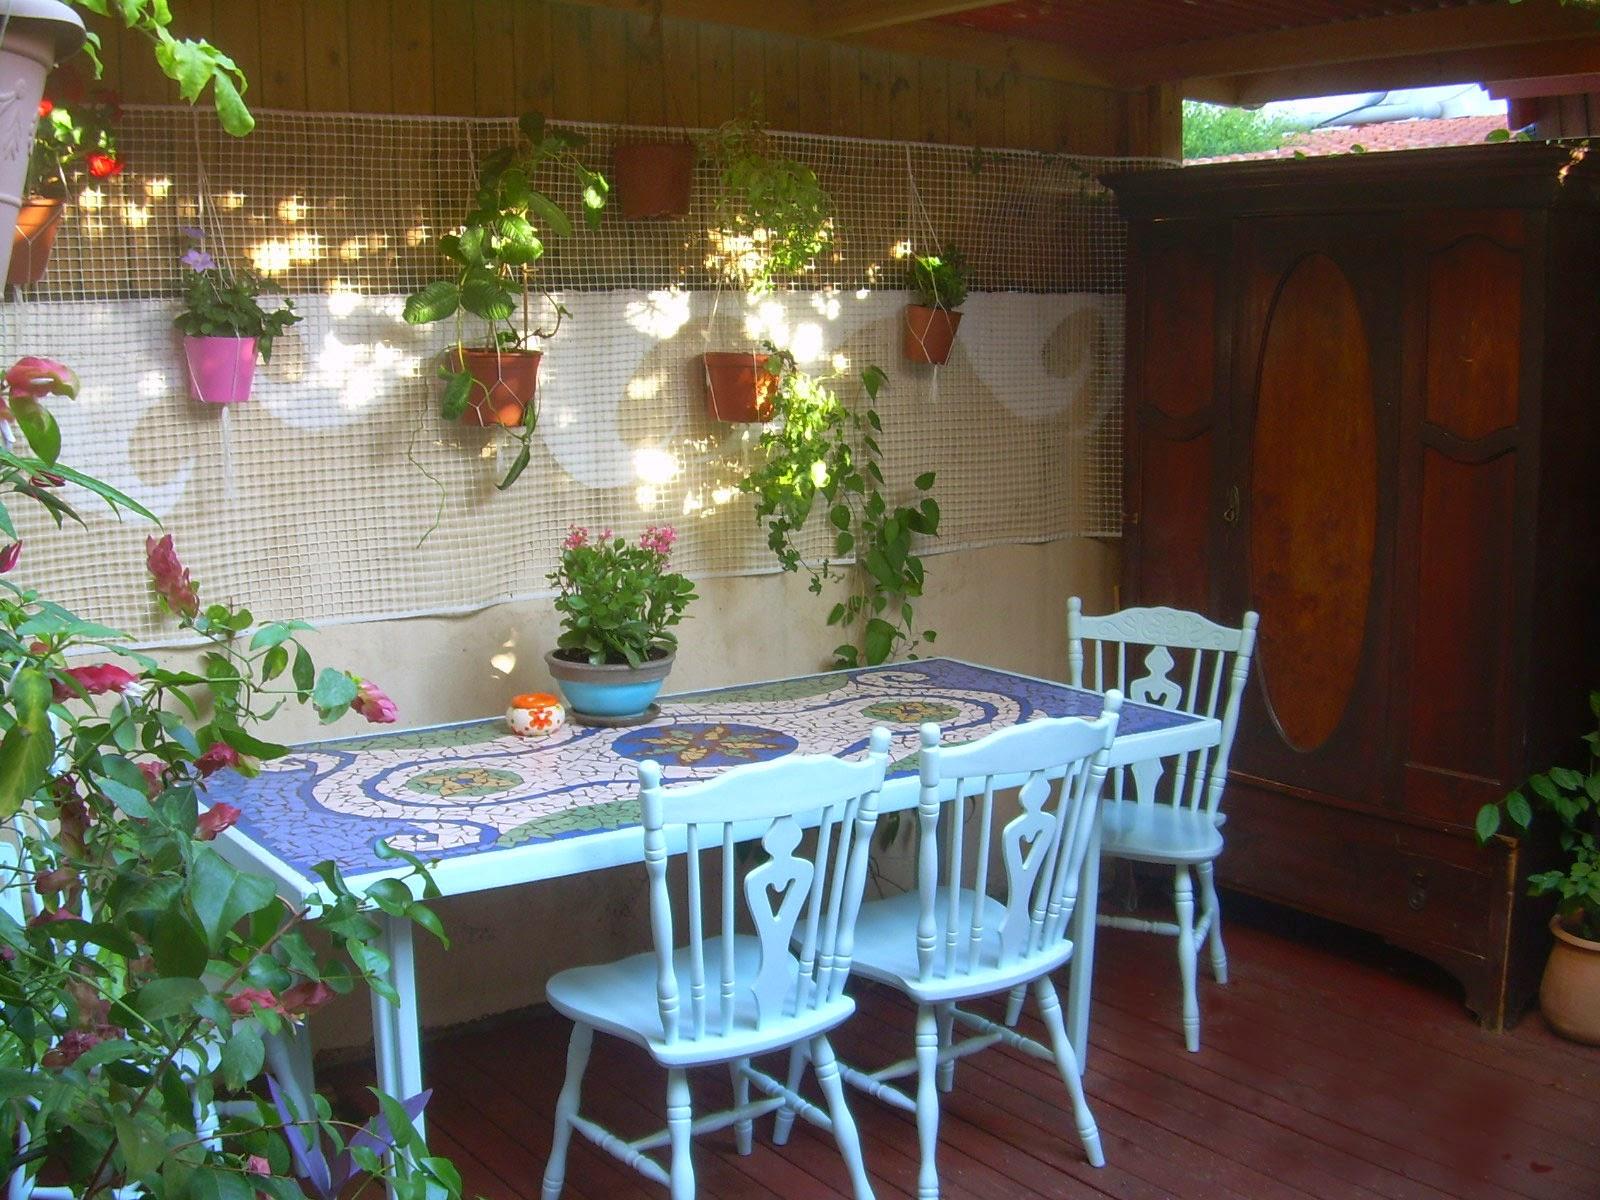 שולחן פסיפס לחצר